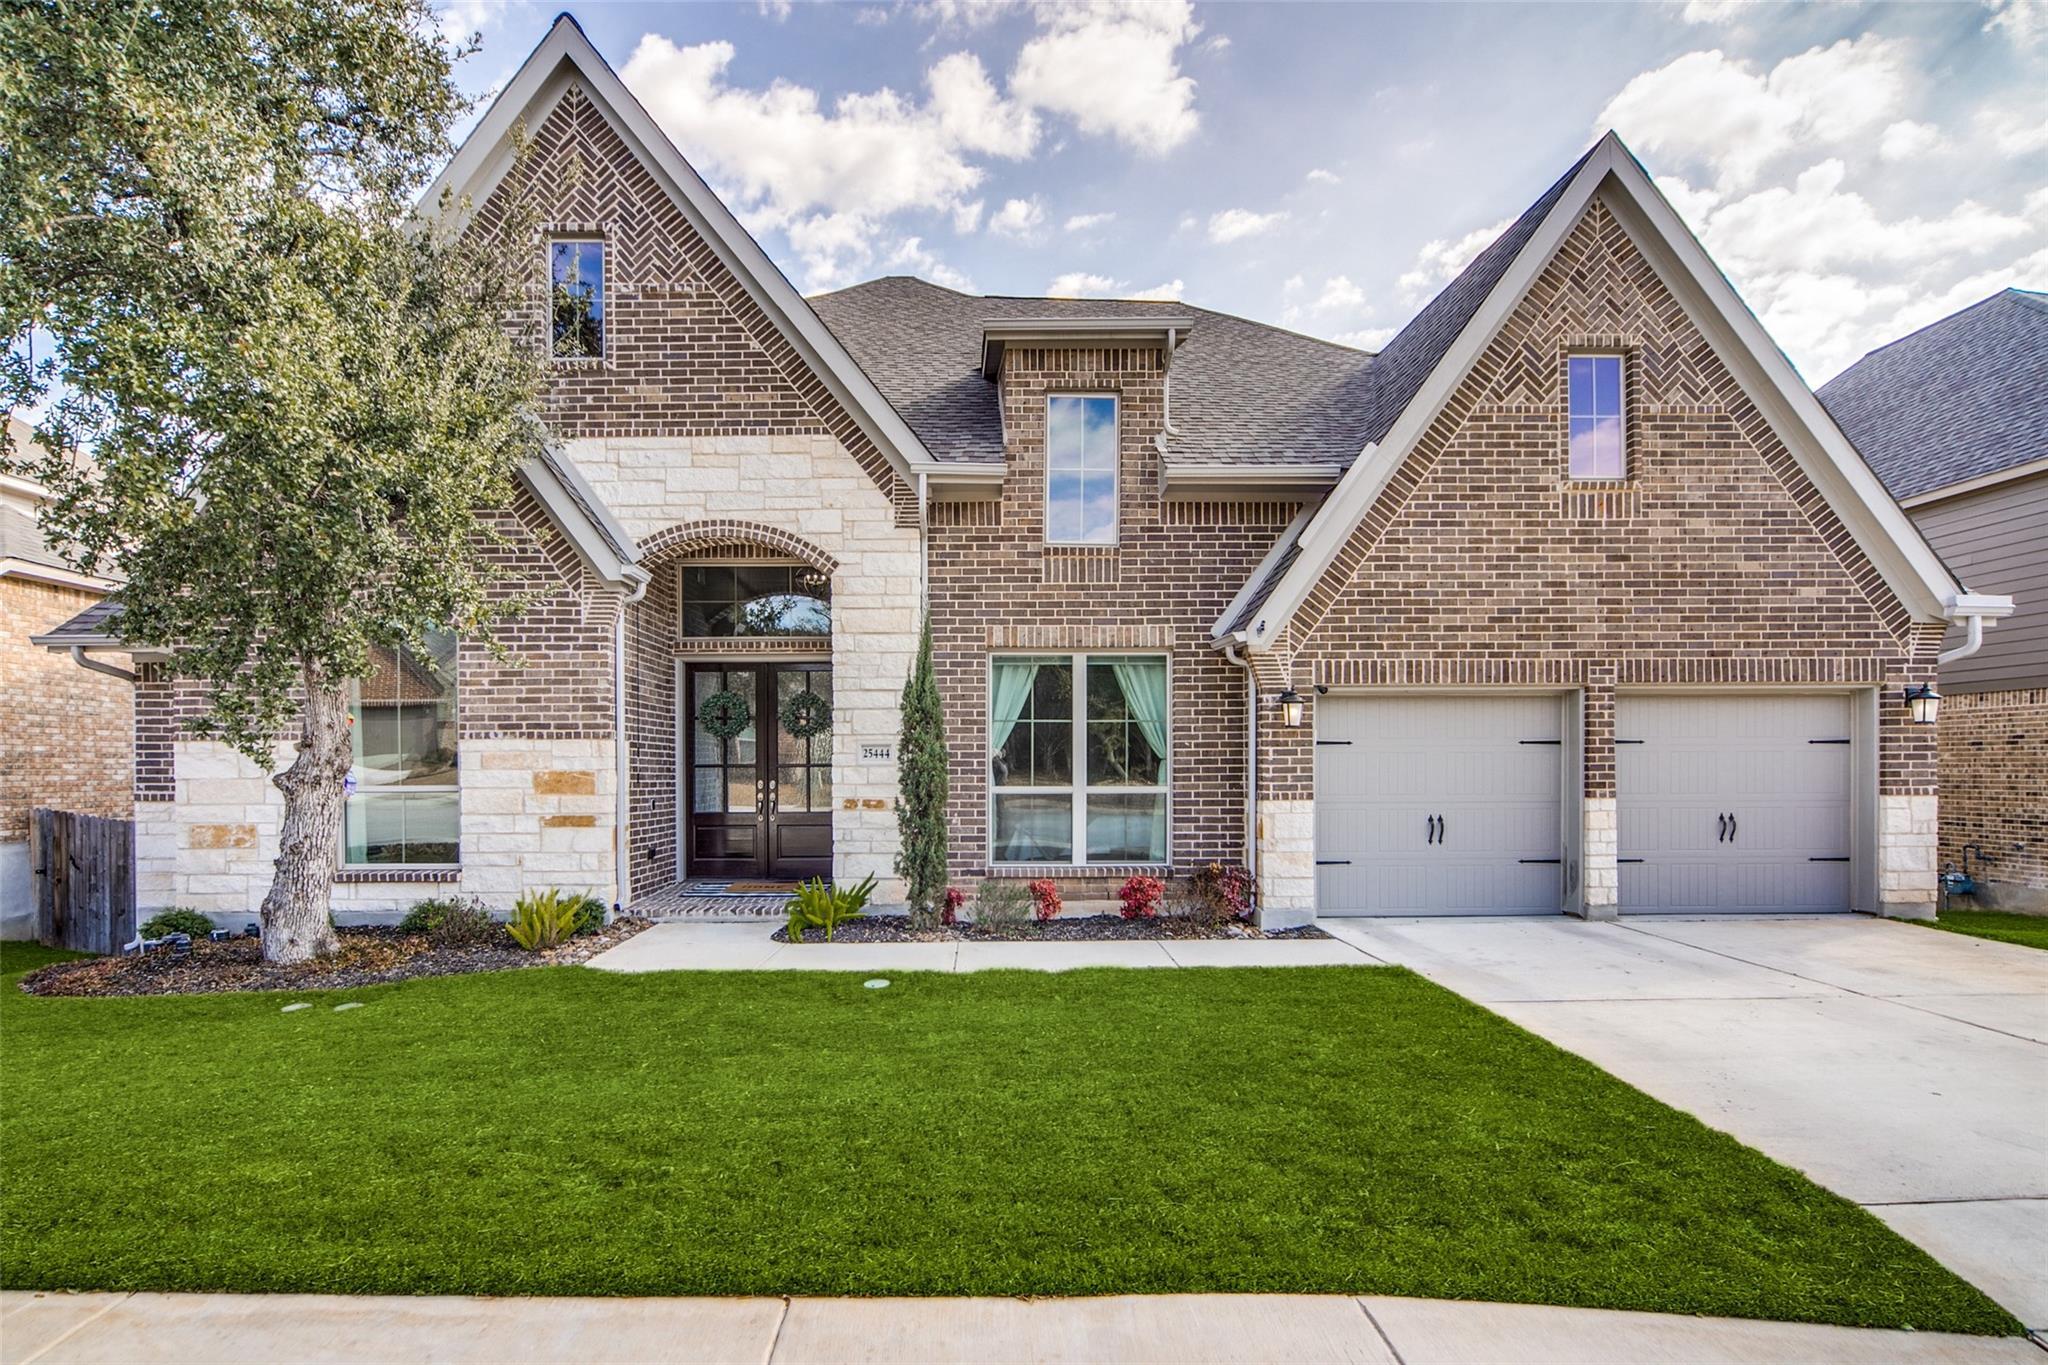 25444 River Ledge Property Photo - San Antonio, TX real estate listing